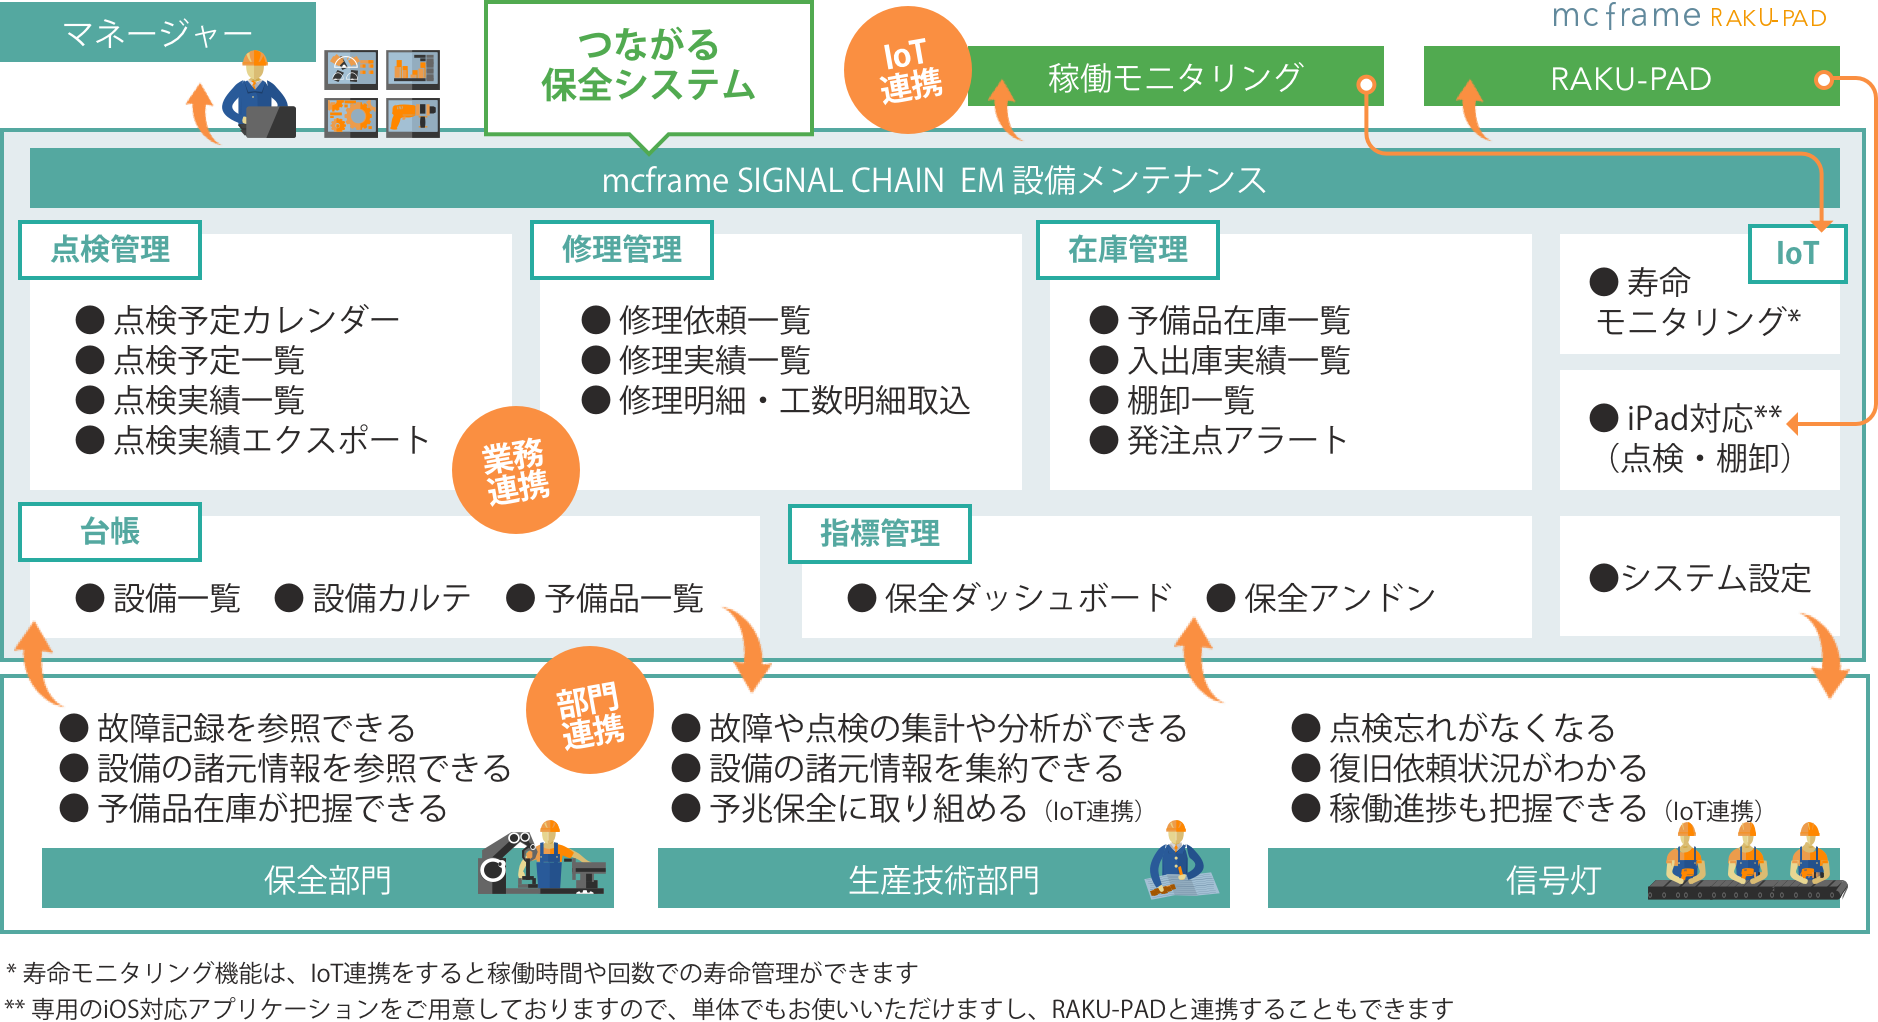 mcframe SIGNAL CHAIN  EM 設備メンテナンスのコンセプト